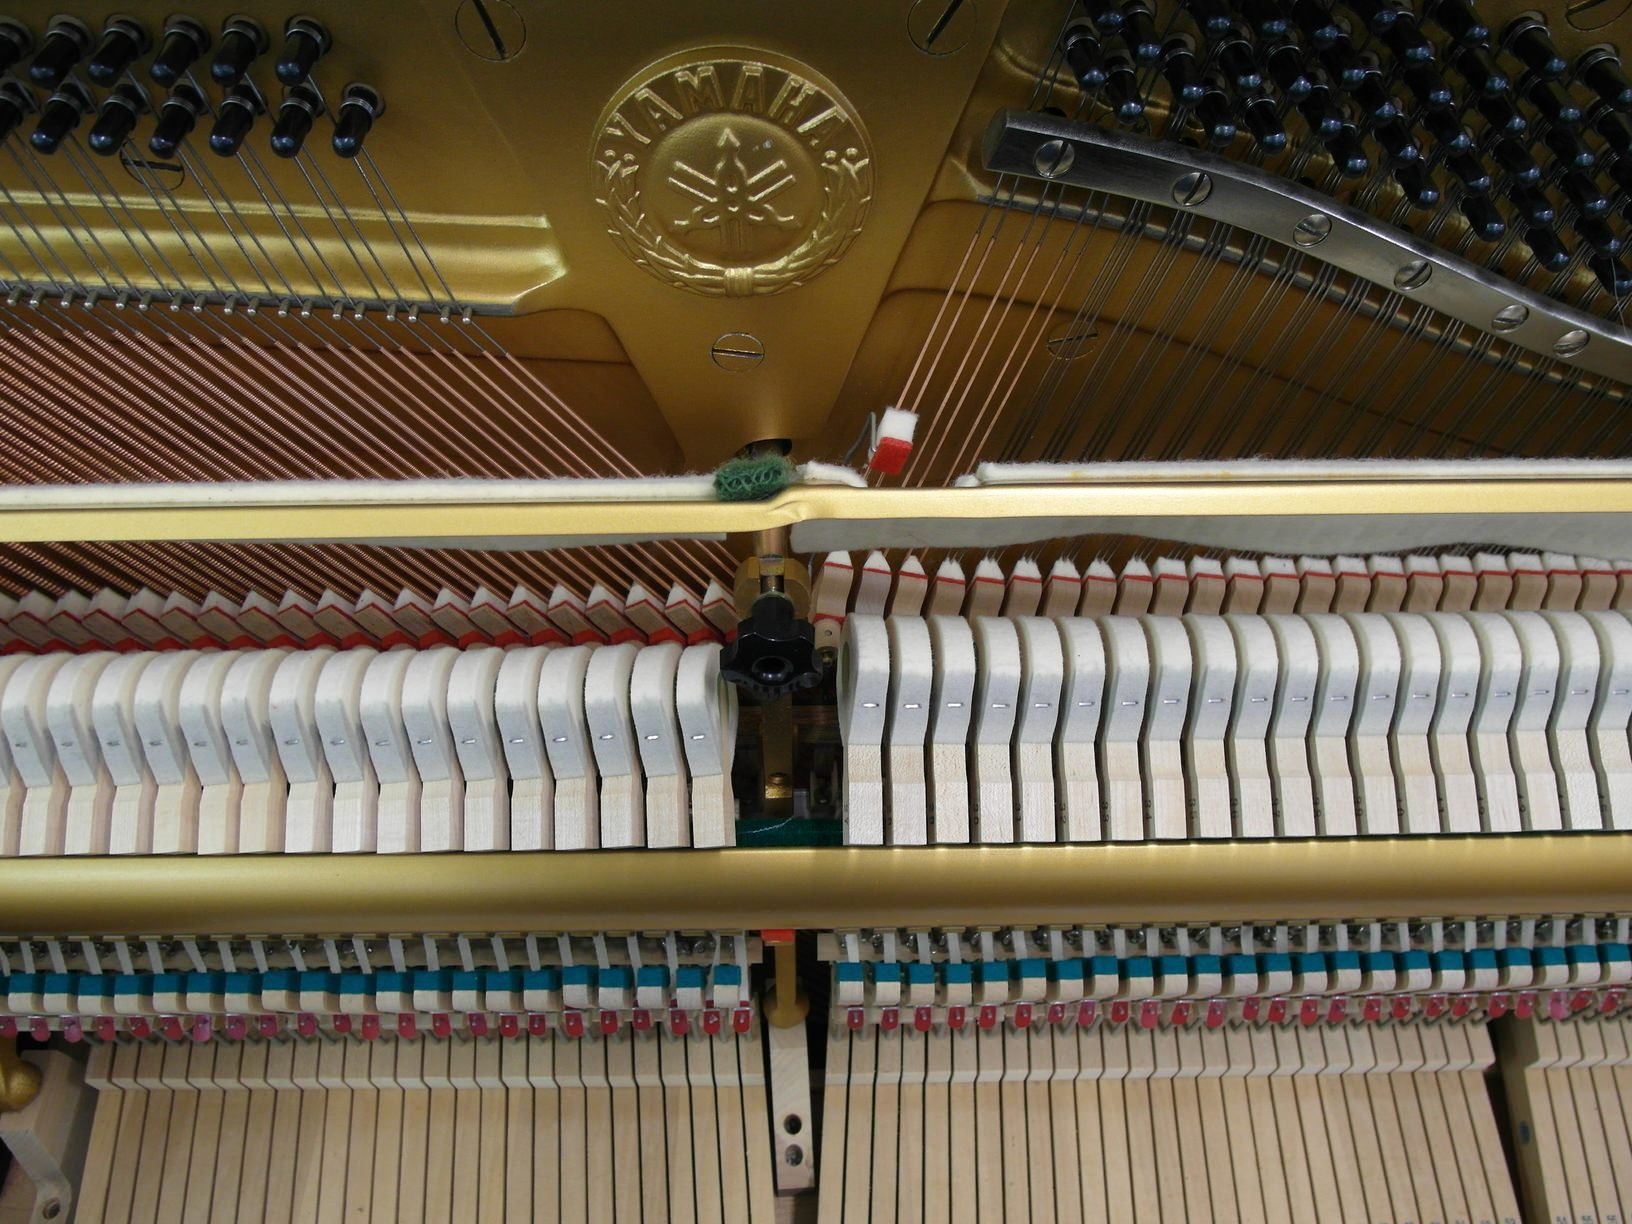 used yamaha piano U3 - excellent condition - interior logo